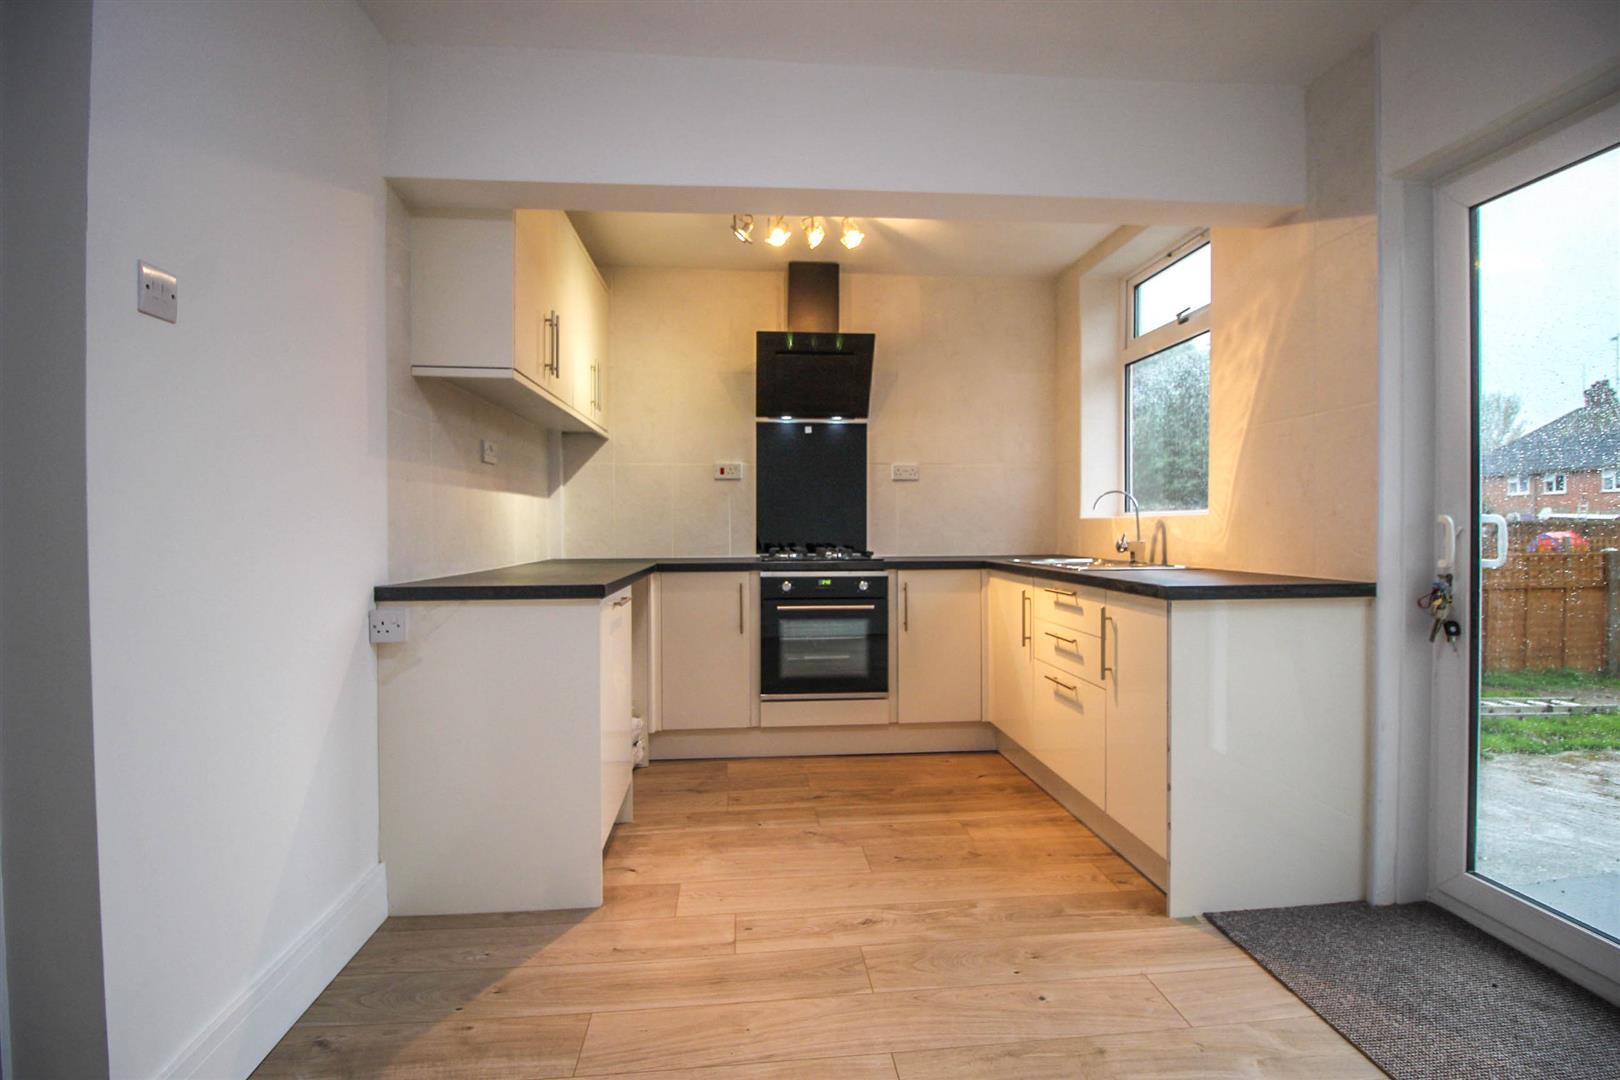 3 Bedrooms End Of Terrace House for sale in Hazel Road, Redditch